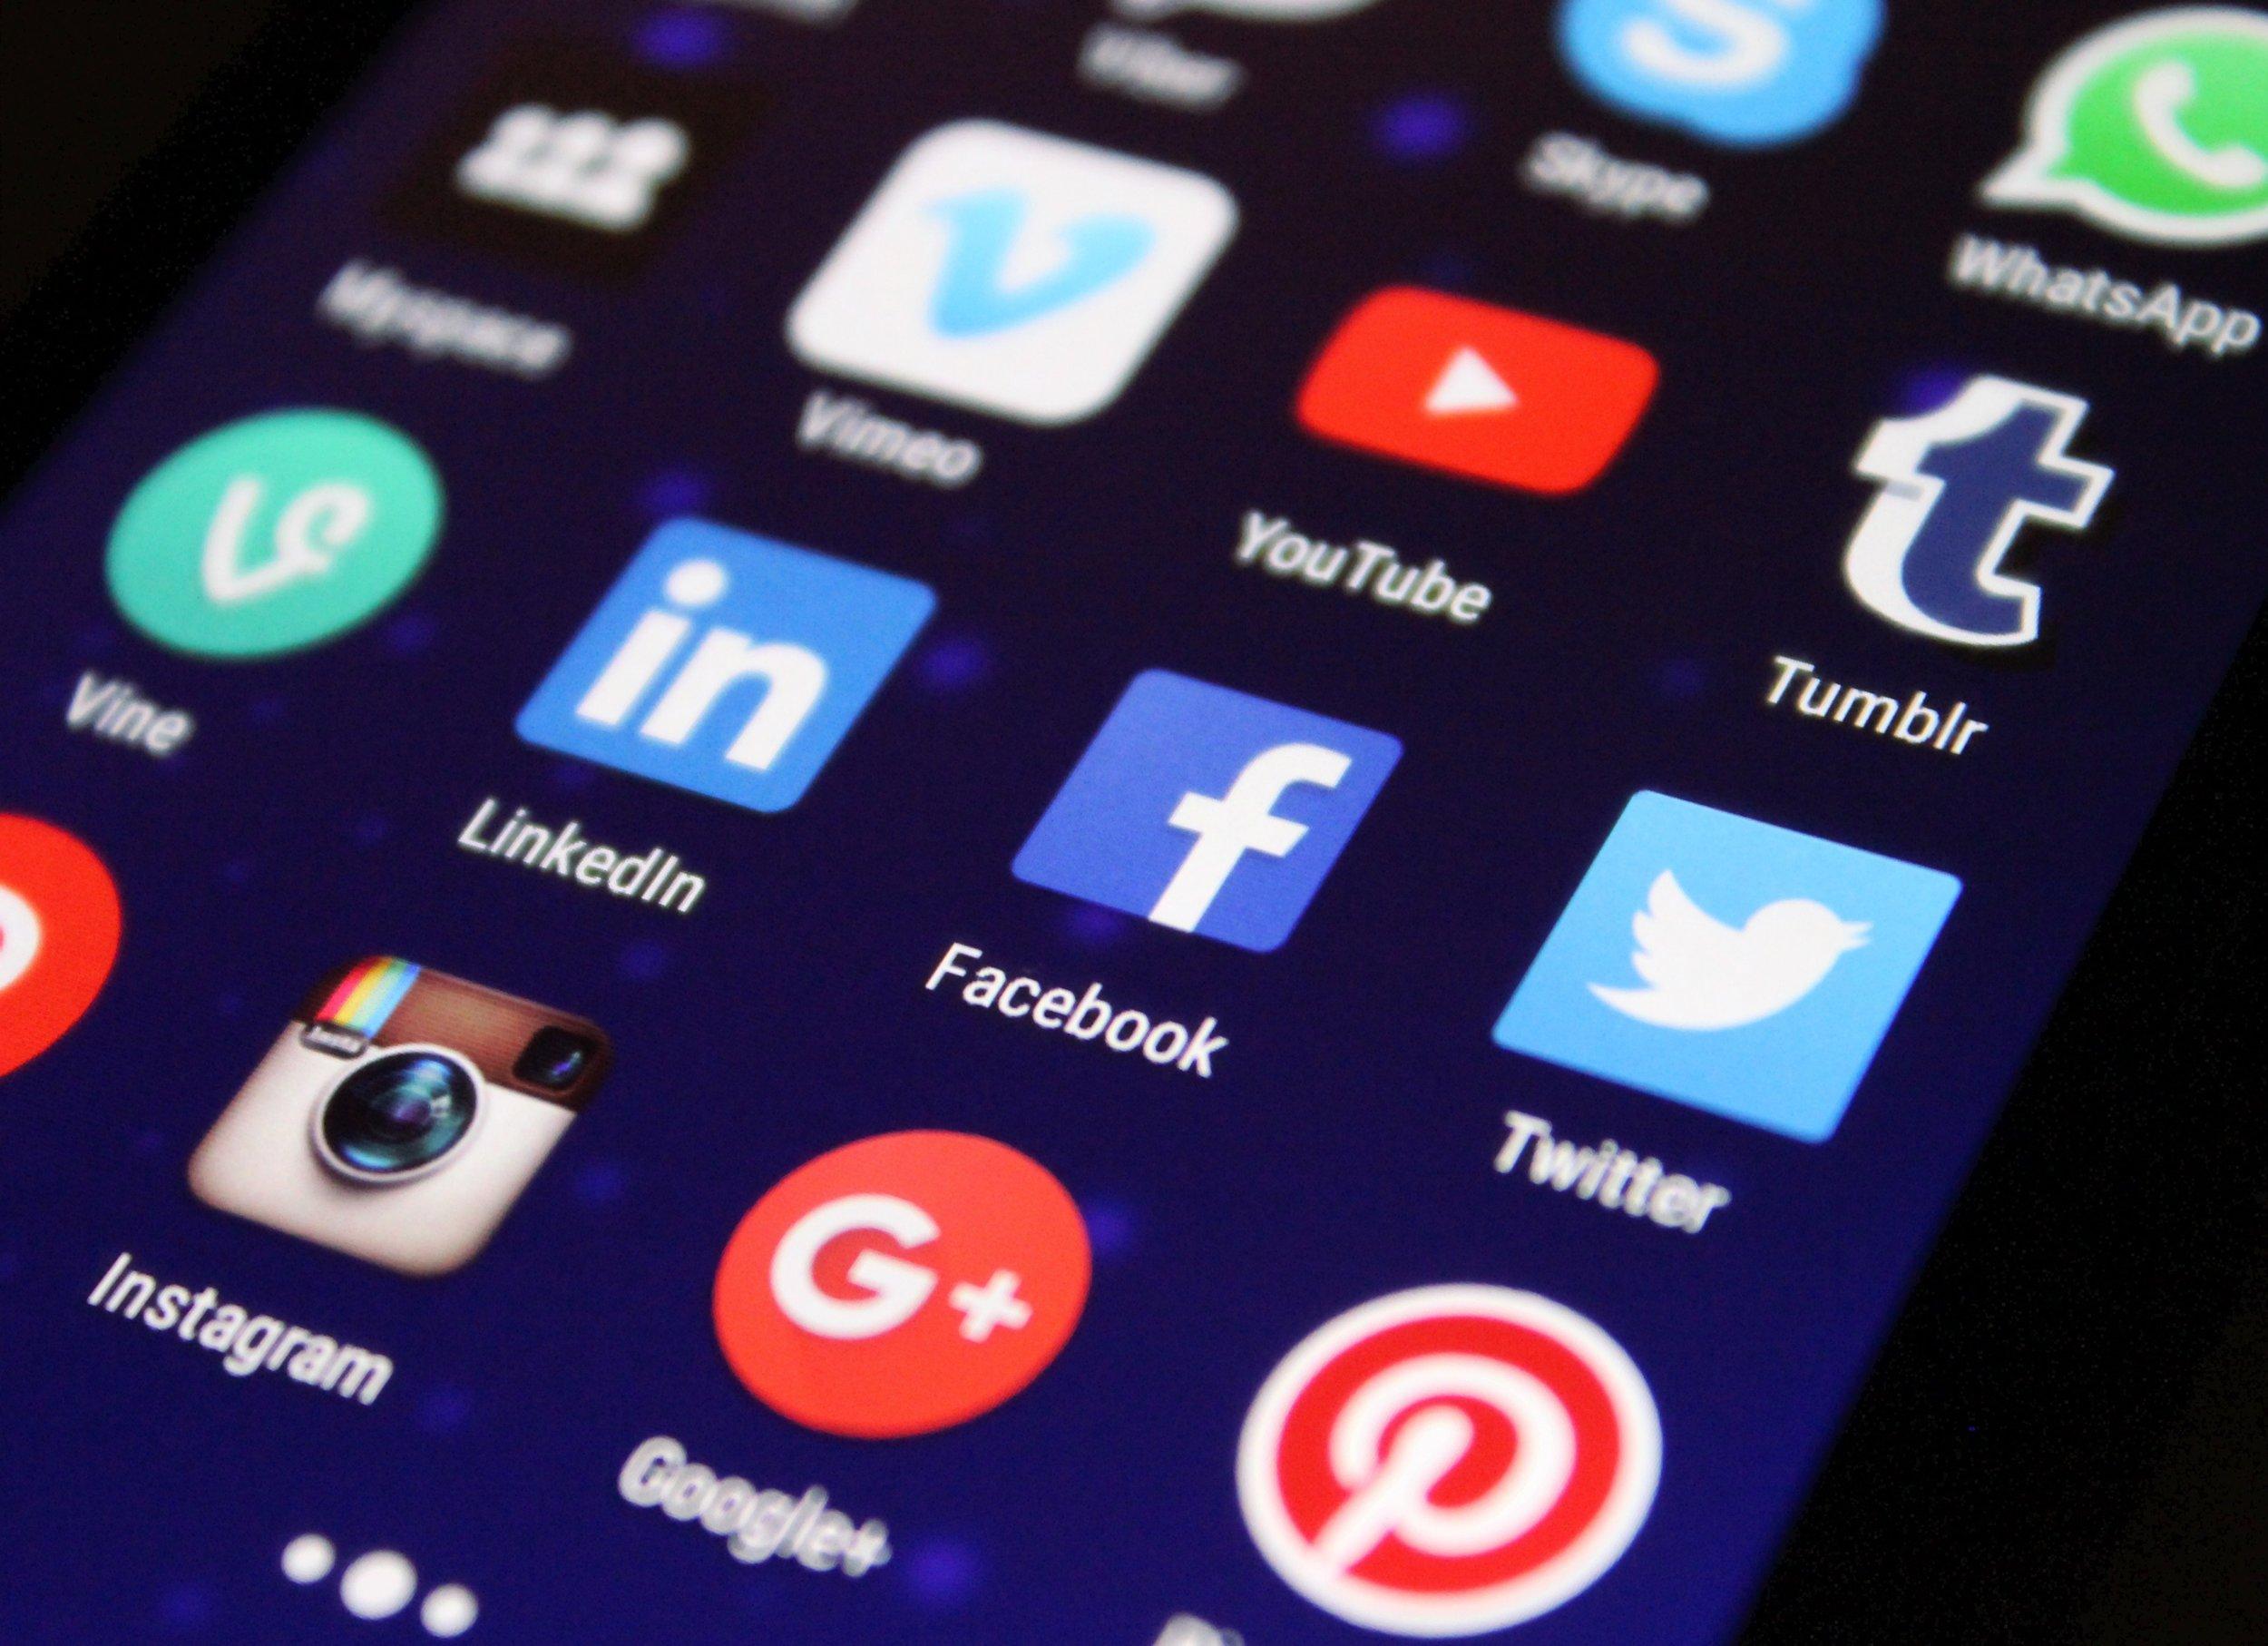 accounts-applications-apps-267350.jpg